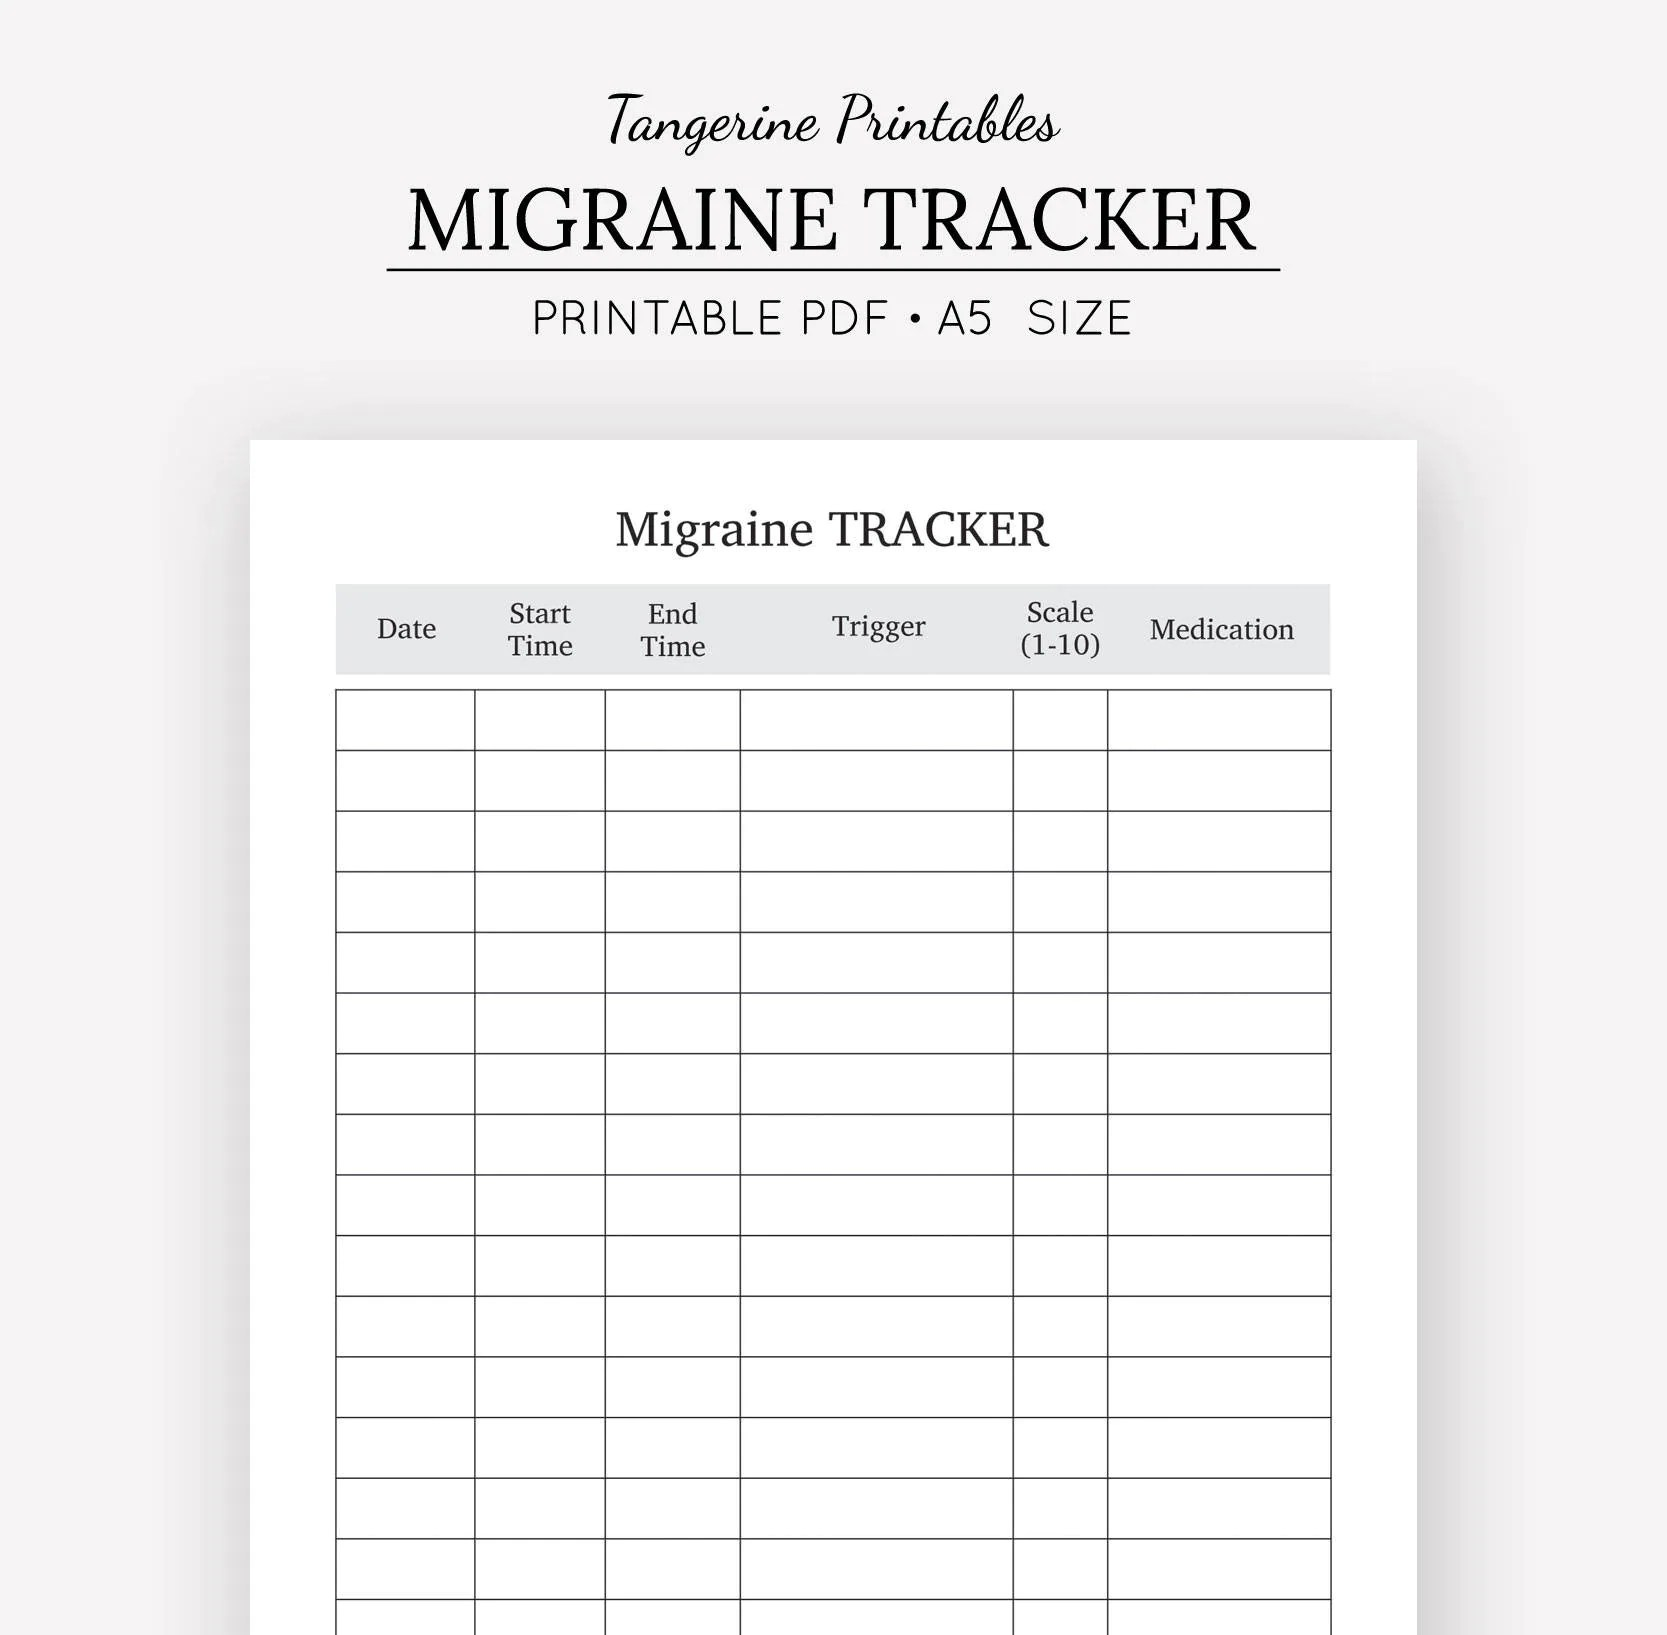 Migraine Tracker Pain Tracker A5 Planner Insert A5